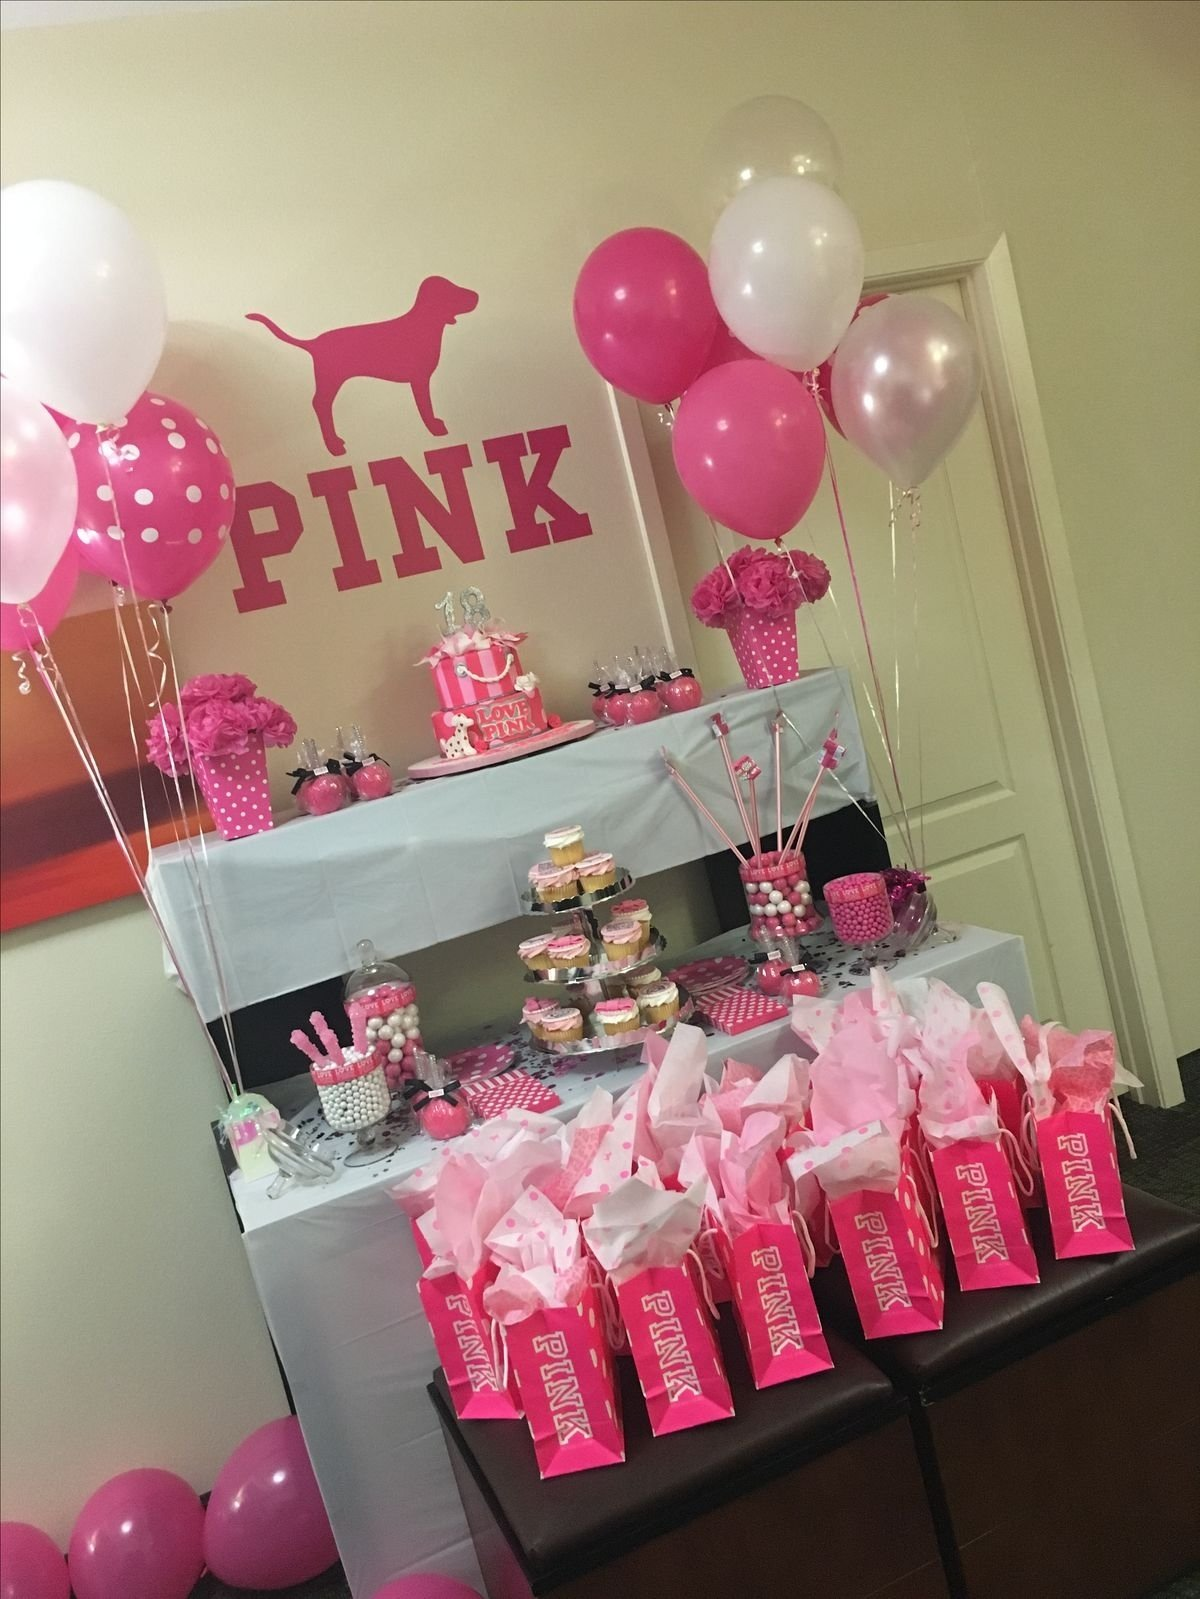 10 Fantastic 14 Year Old Birthday Ideas themes birthday good ideas for a 13 year old birthday party girl 11 2020